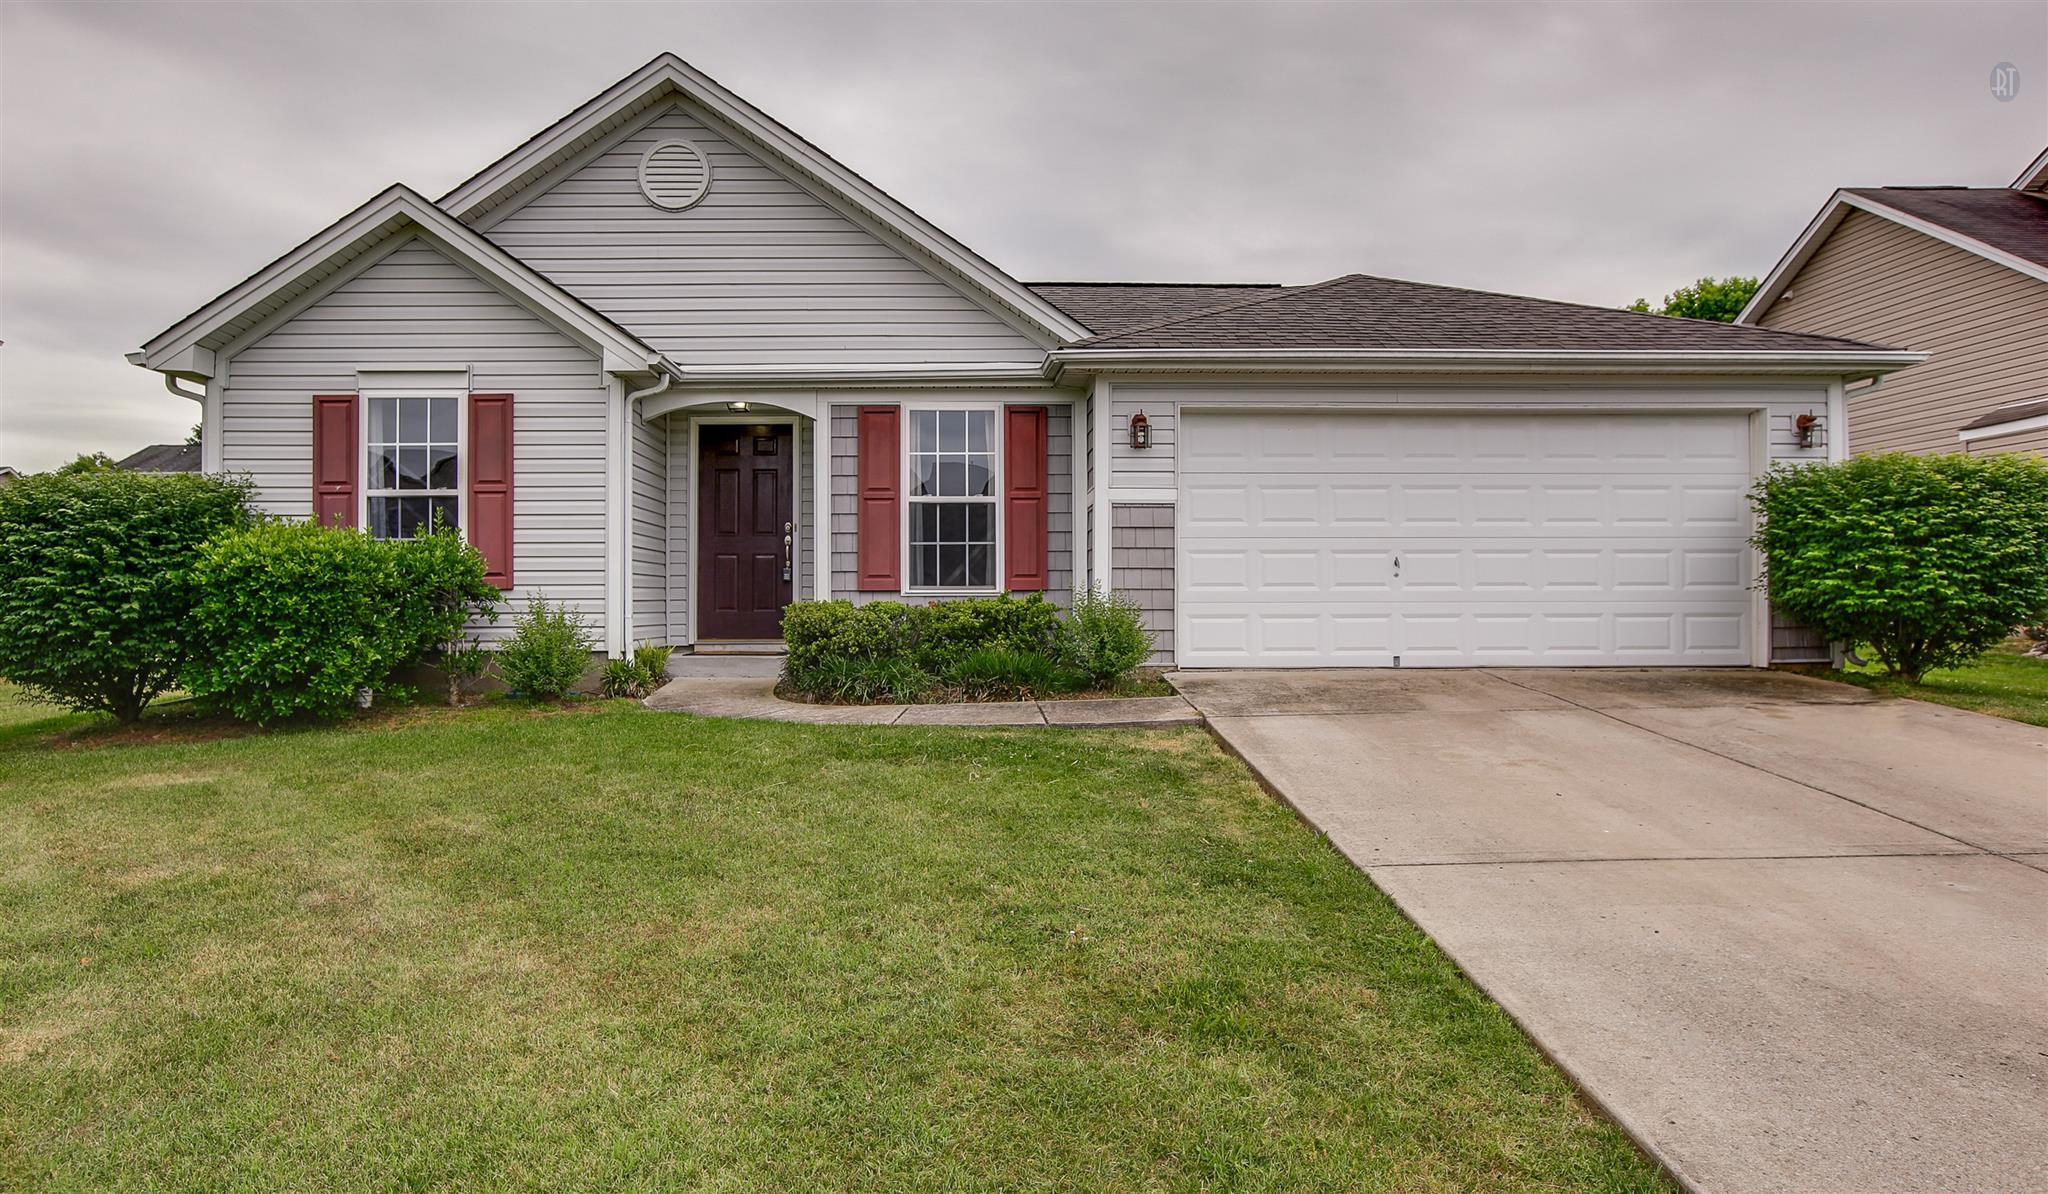 422 Creekside Ln, Spring Hill, TN 37174